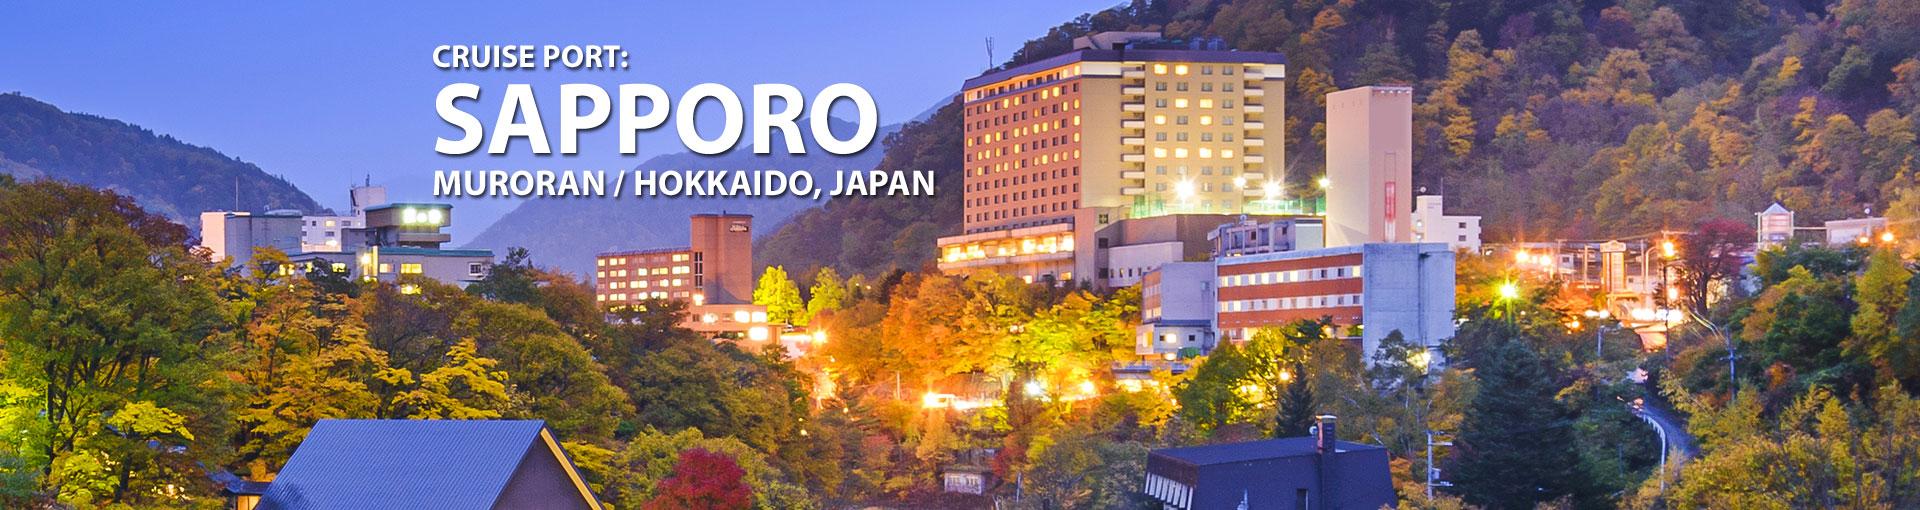 Cruises to Sapporo Muroran Hokkaido, Japan